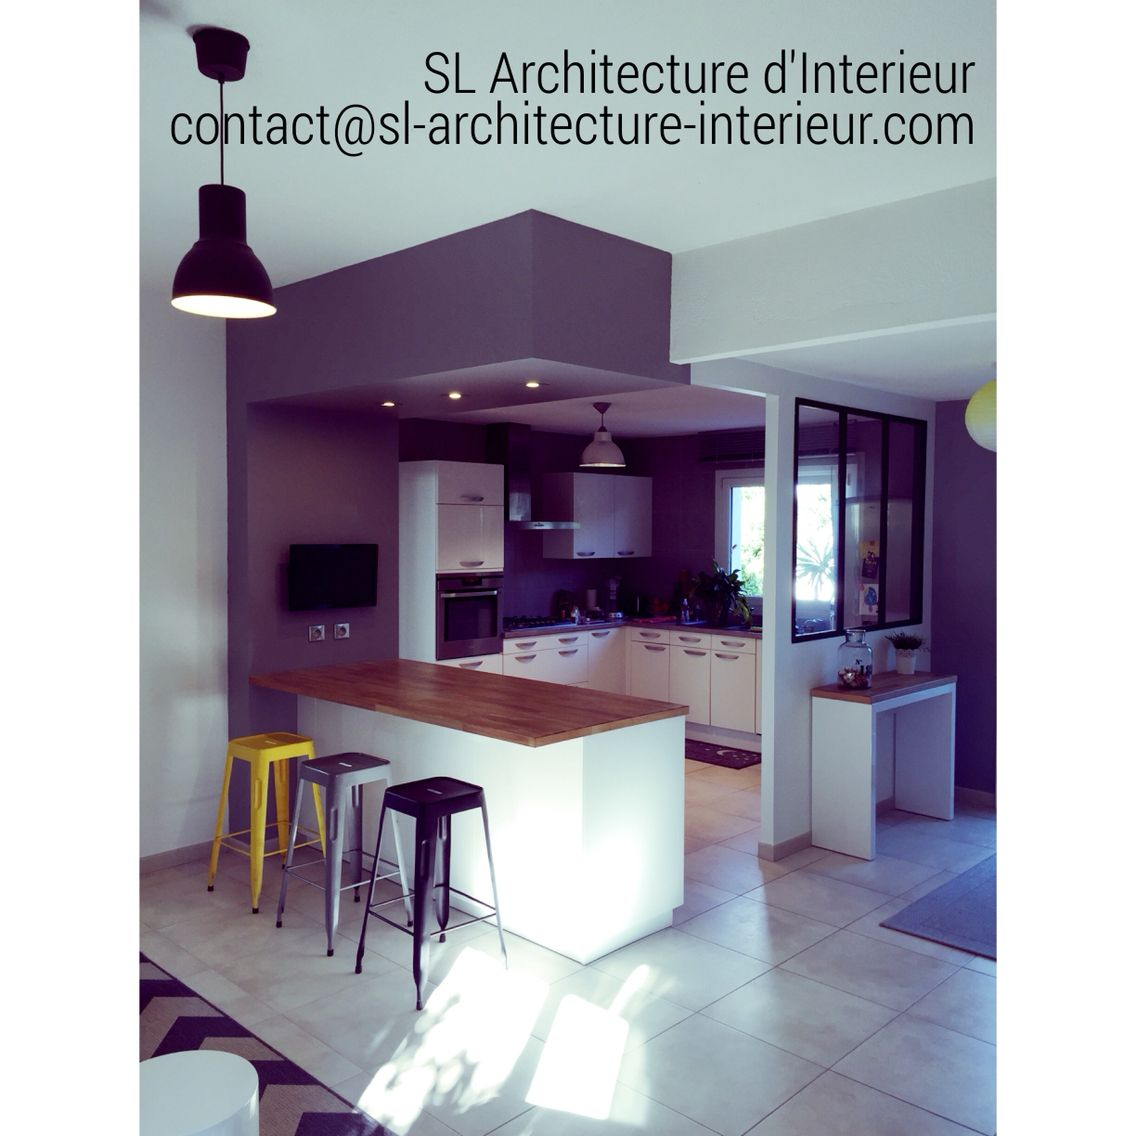 #amenagement #cuisine #kitchen #design #decoration #architectureinterieure #designinterior #www.sl-architecture-interieur.com